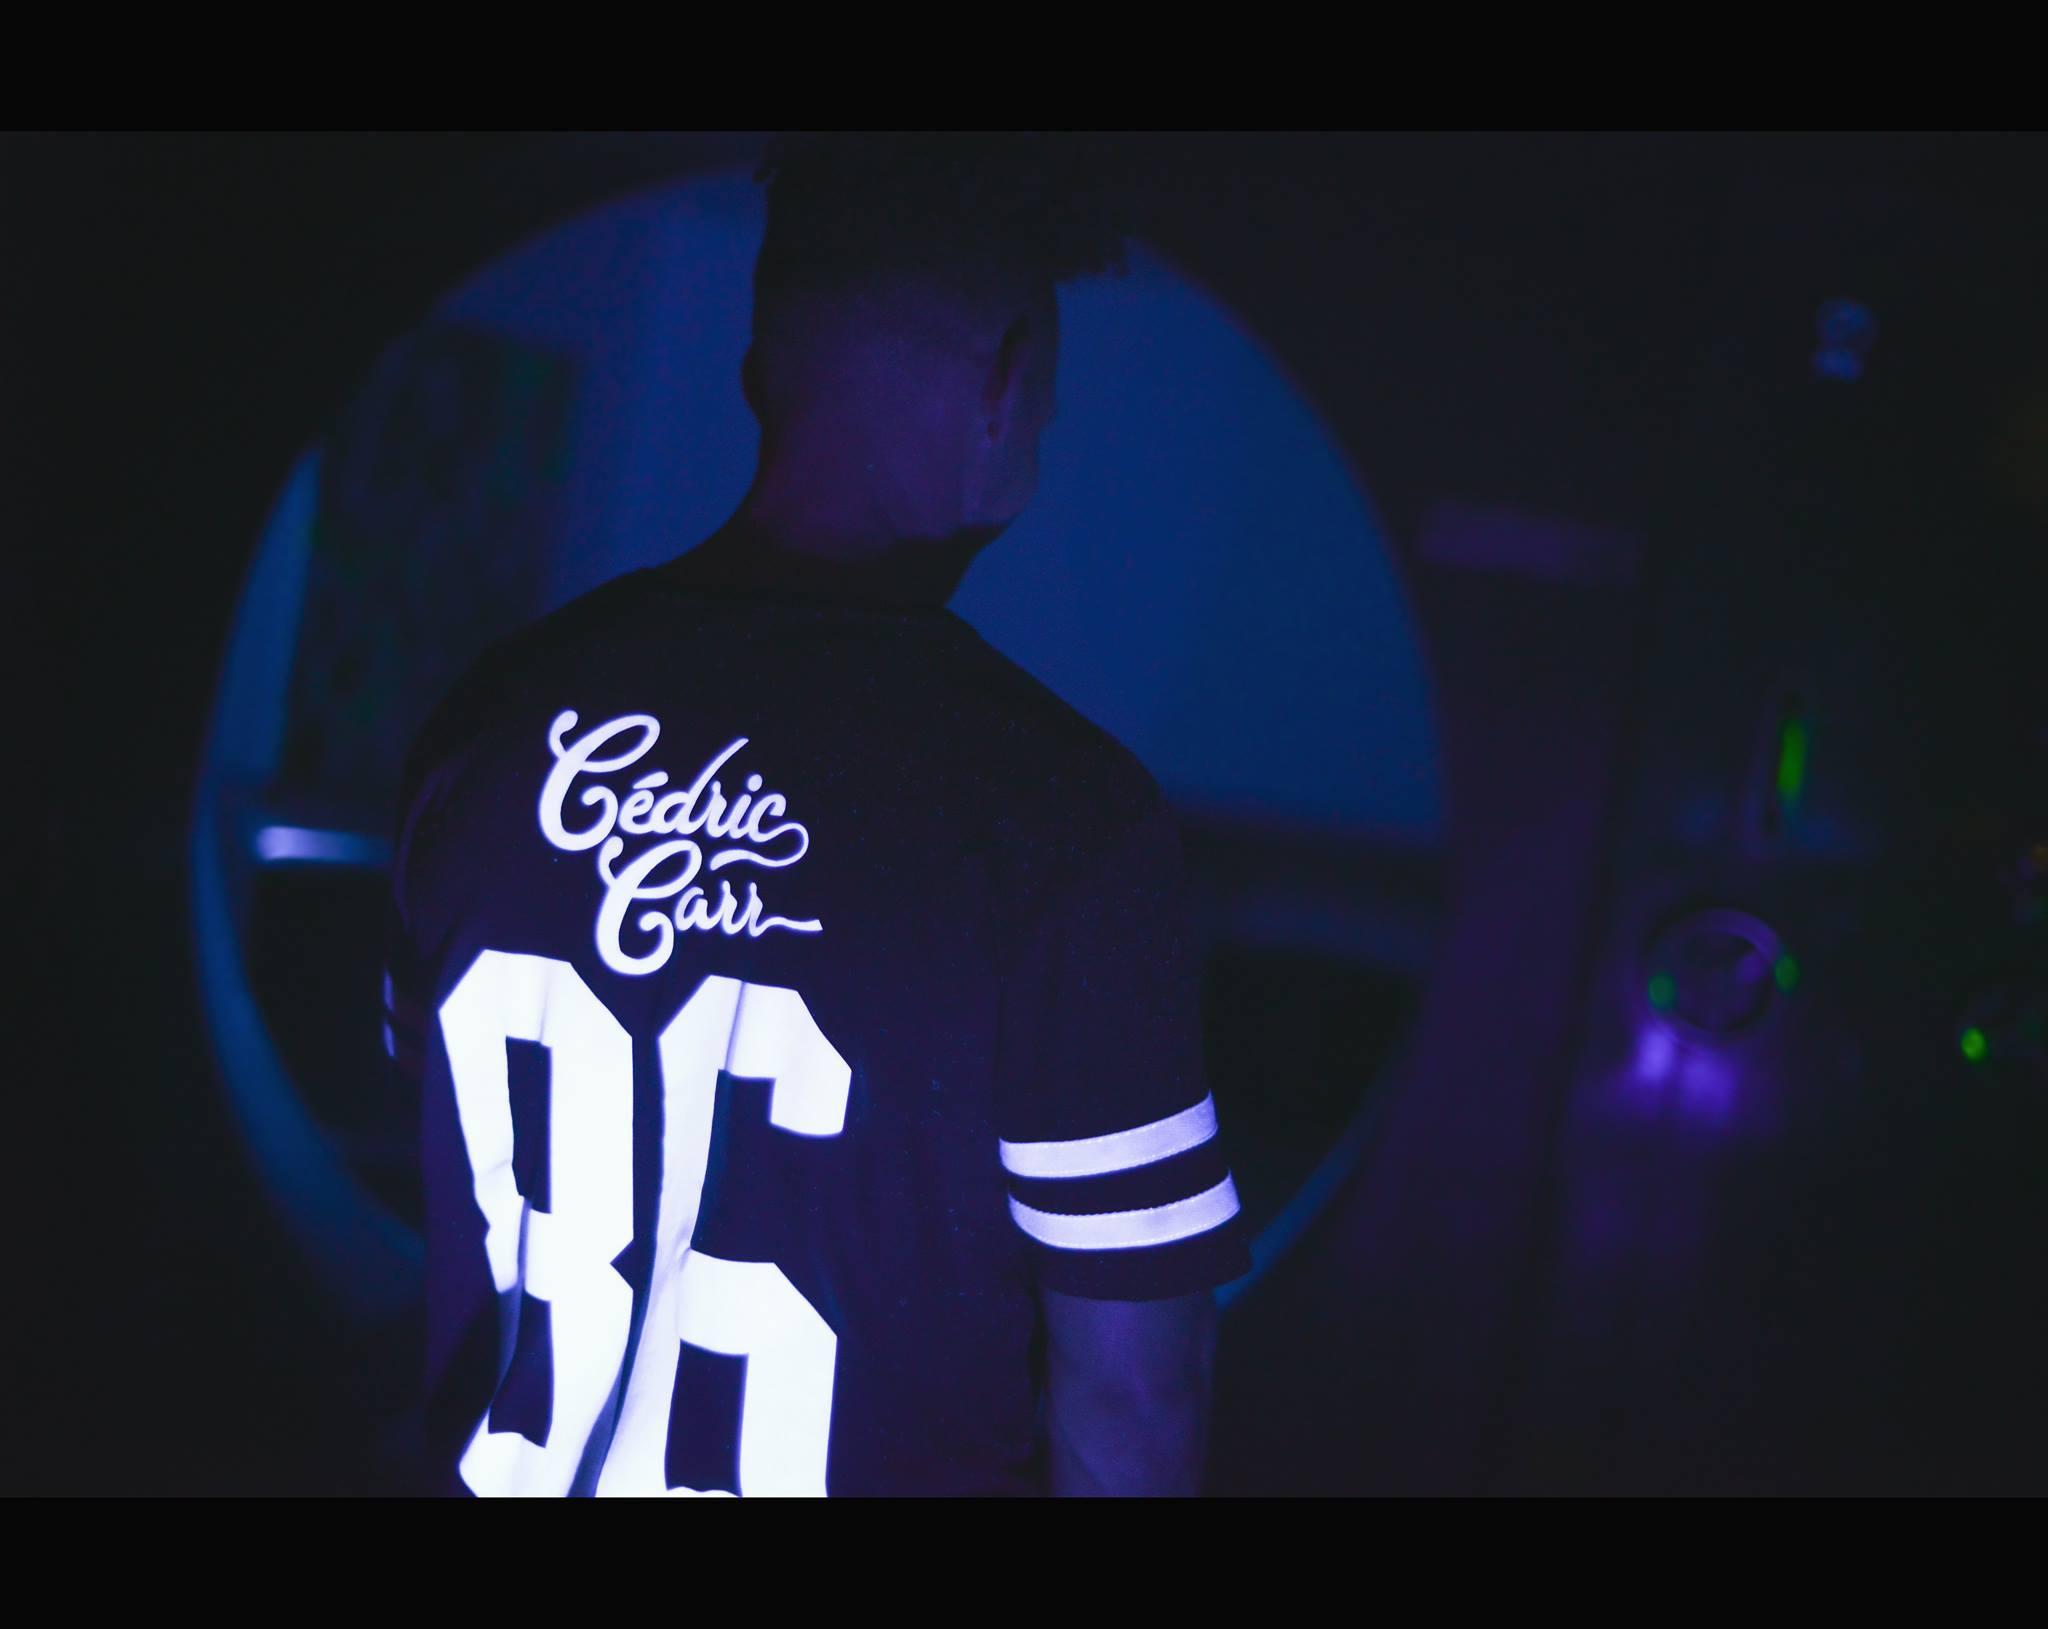 Cedric Carr